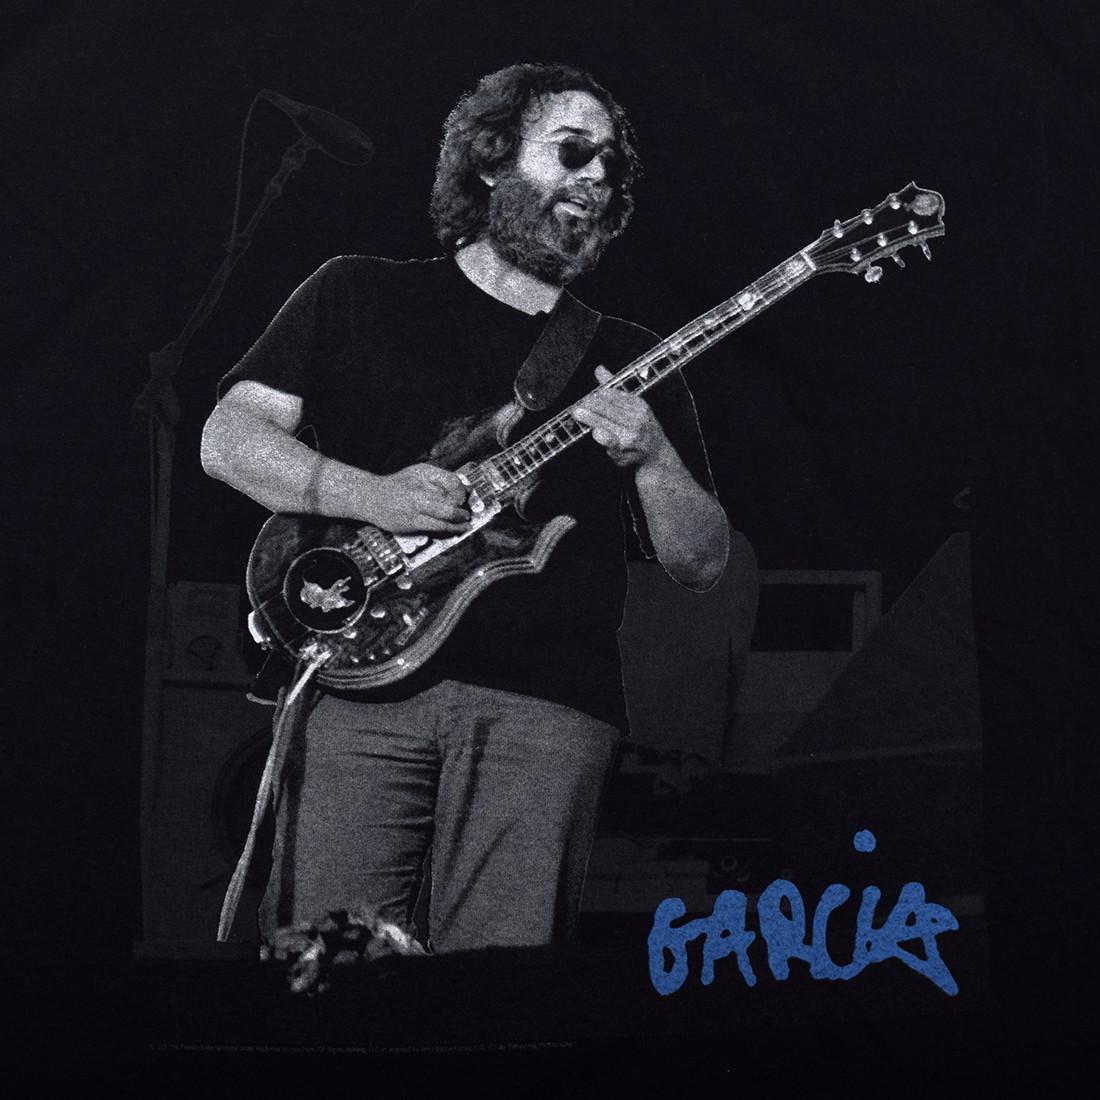 Garcia Live Black T-Shirt